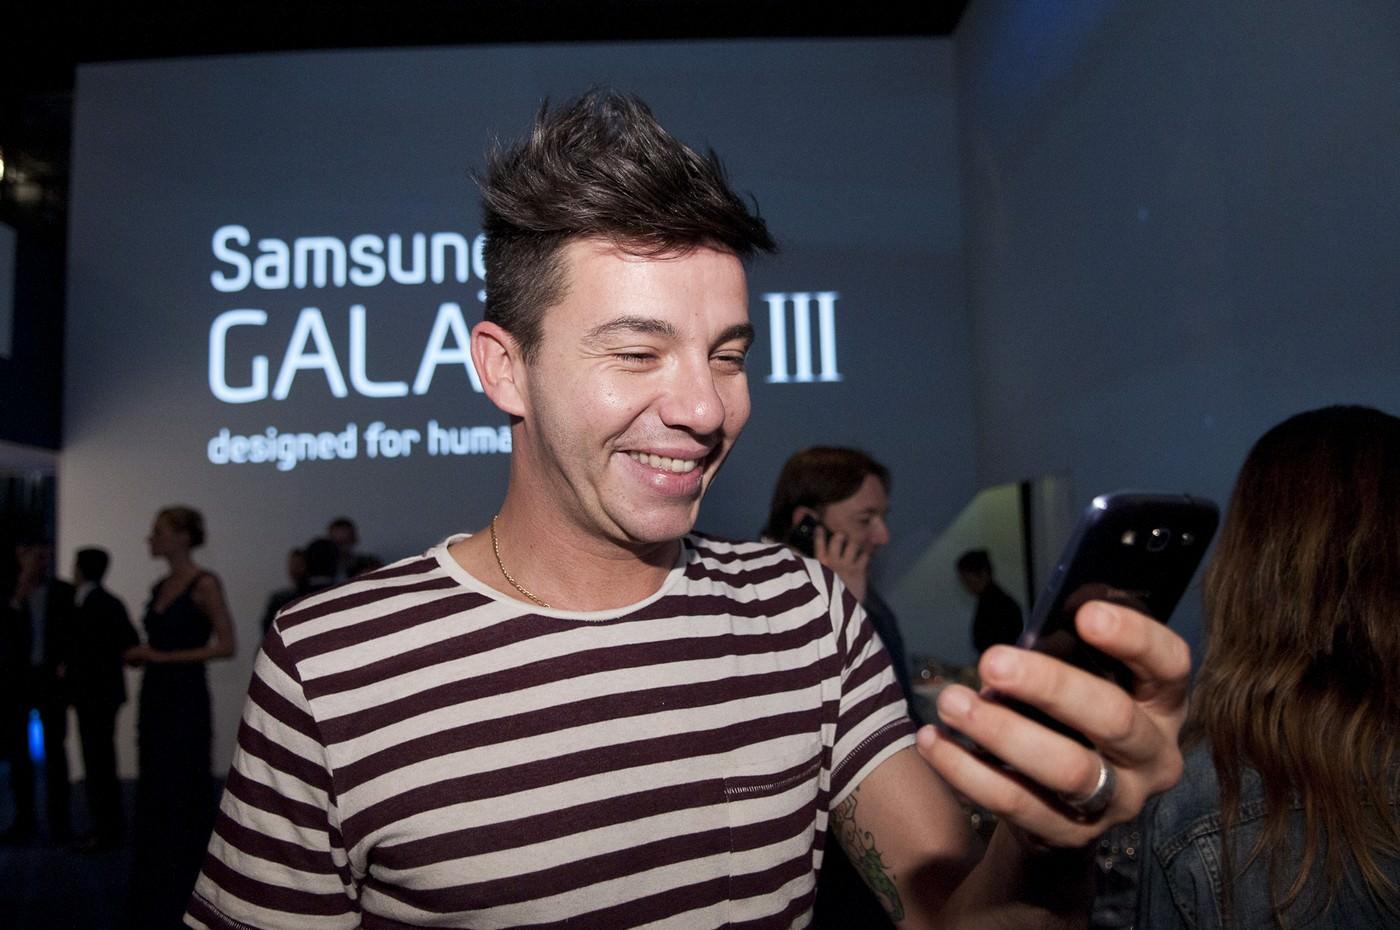 SamsungS306